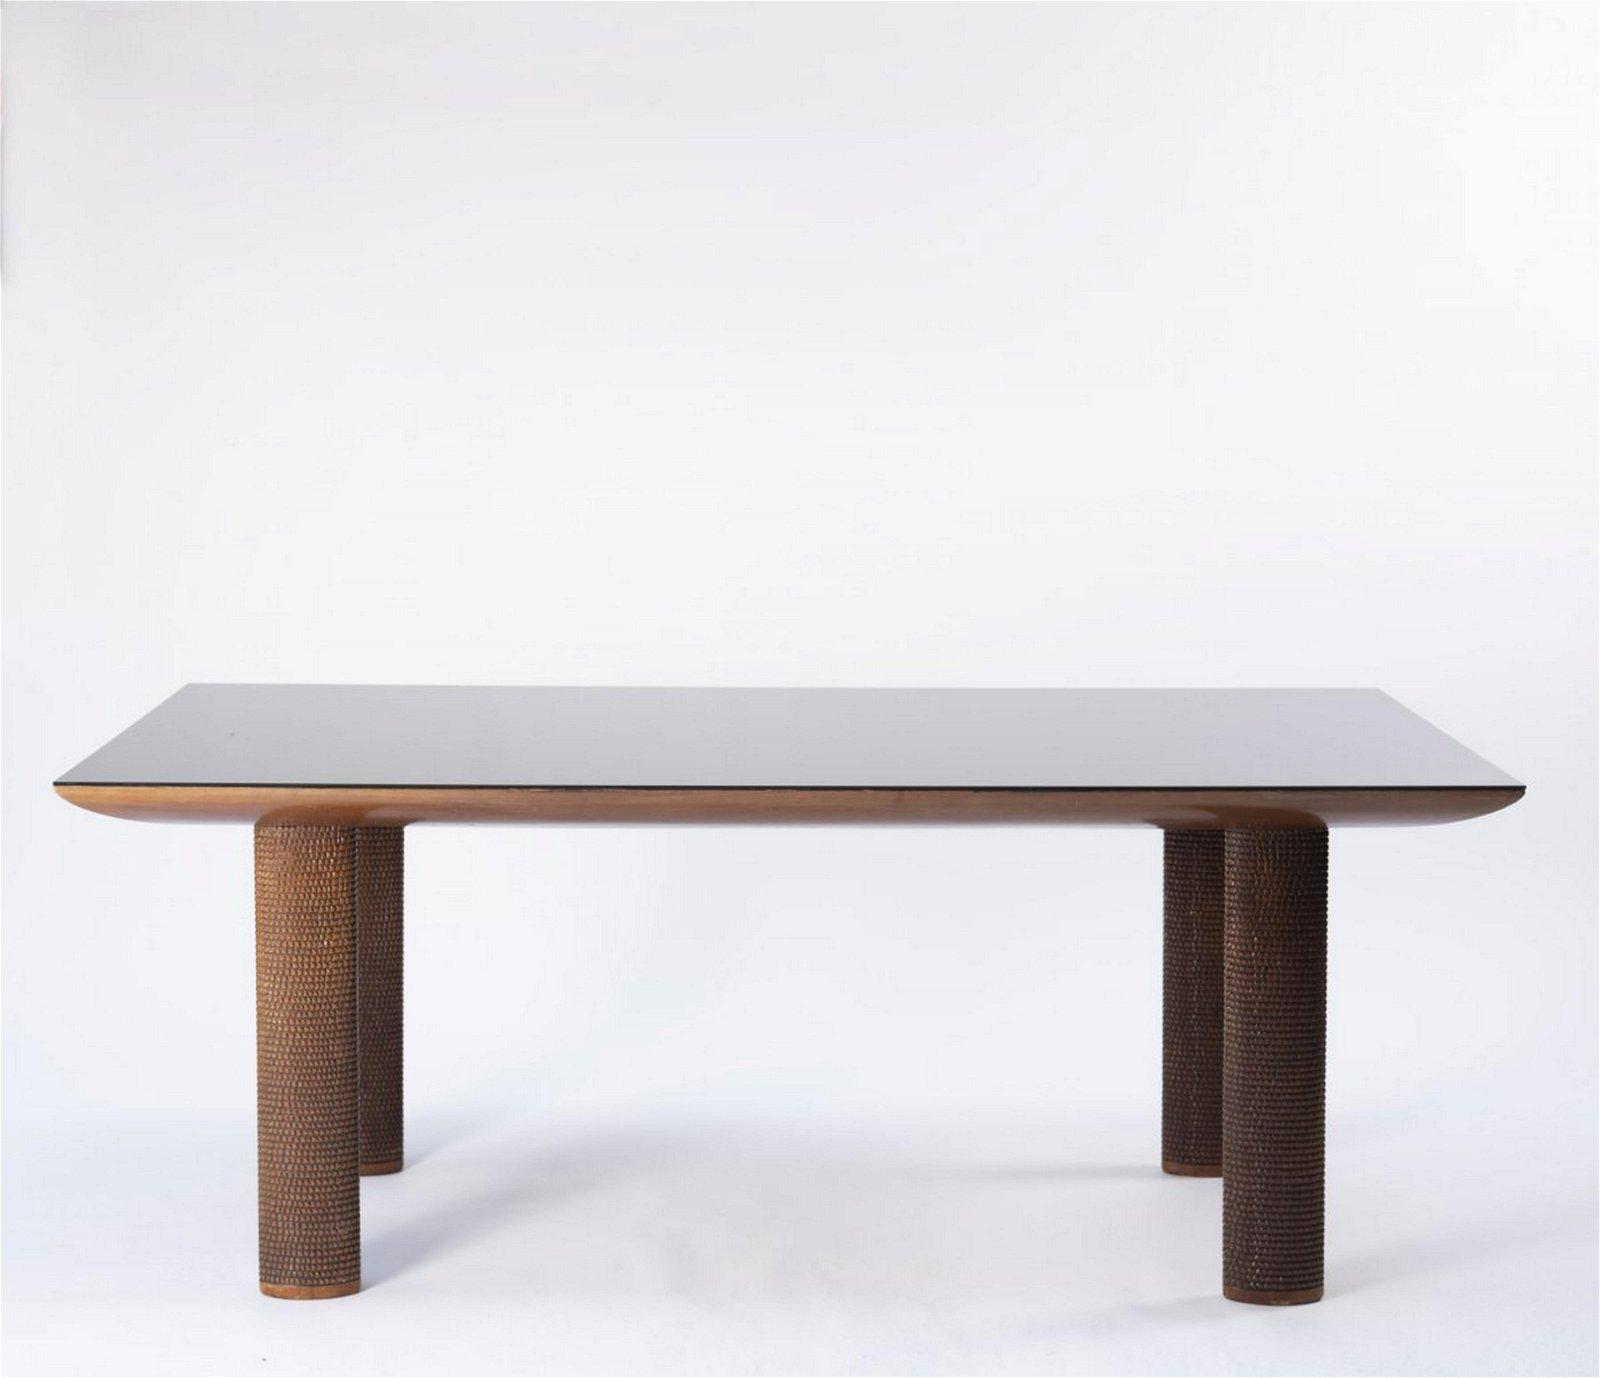 Osvaldo Borsani, Dining table, c. 1937